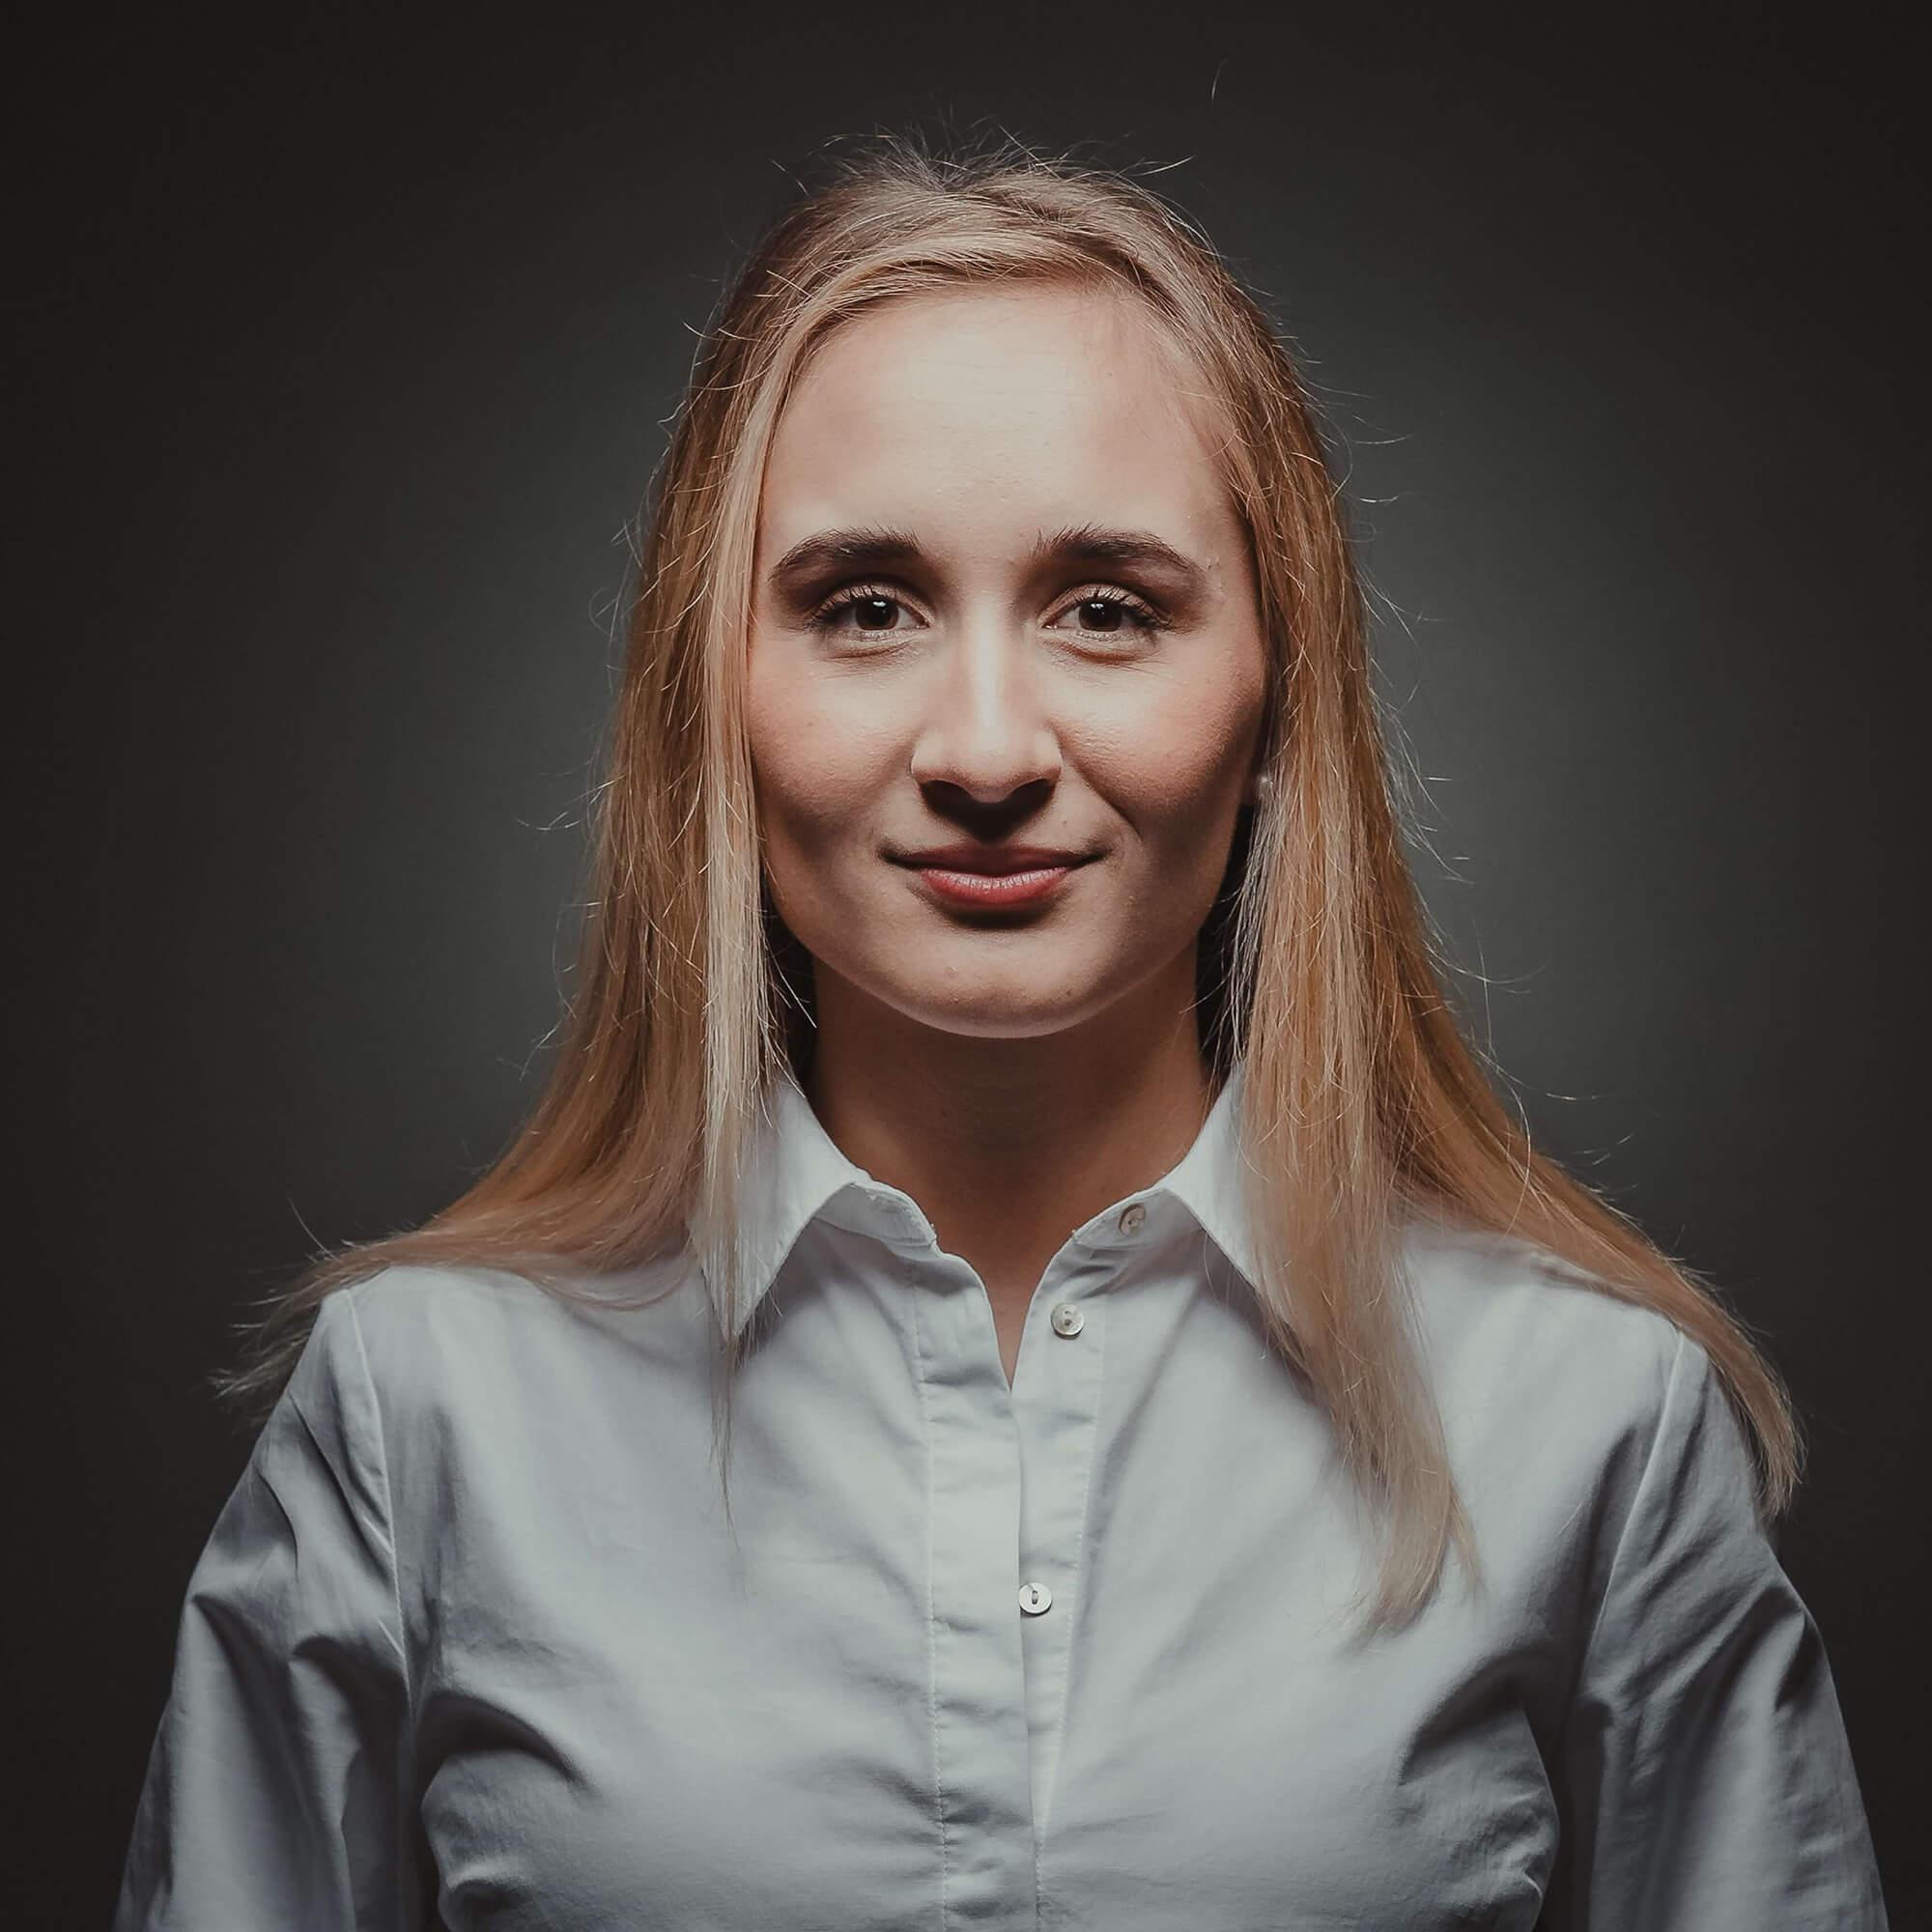 Barbora Horackova headshot